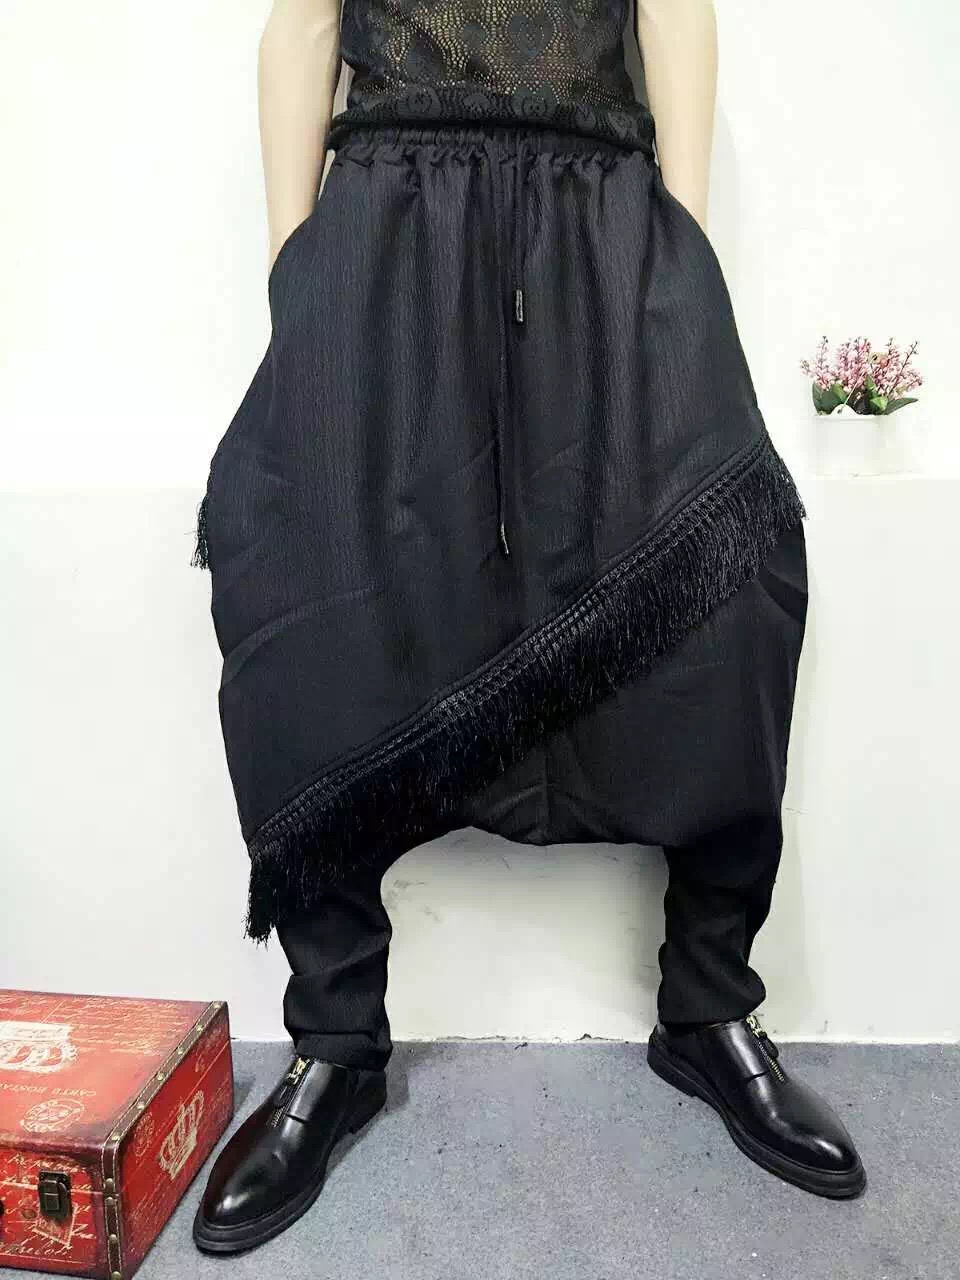 Calle Negro Goth Plus Hip Harem 2019 Tamaño Falda Pantalones Personalidad Hop Las Mujeres La De Gota Fondo BqxXqd